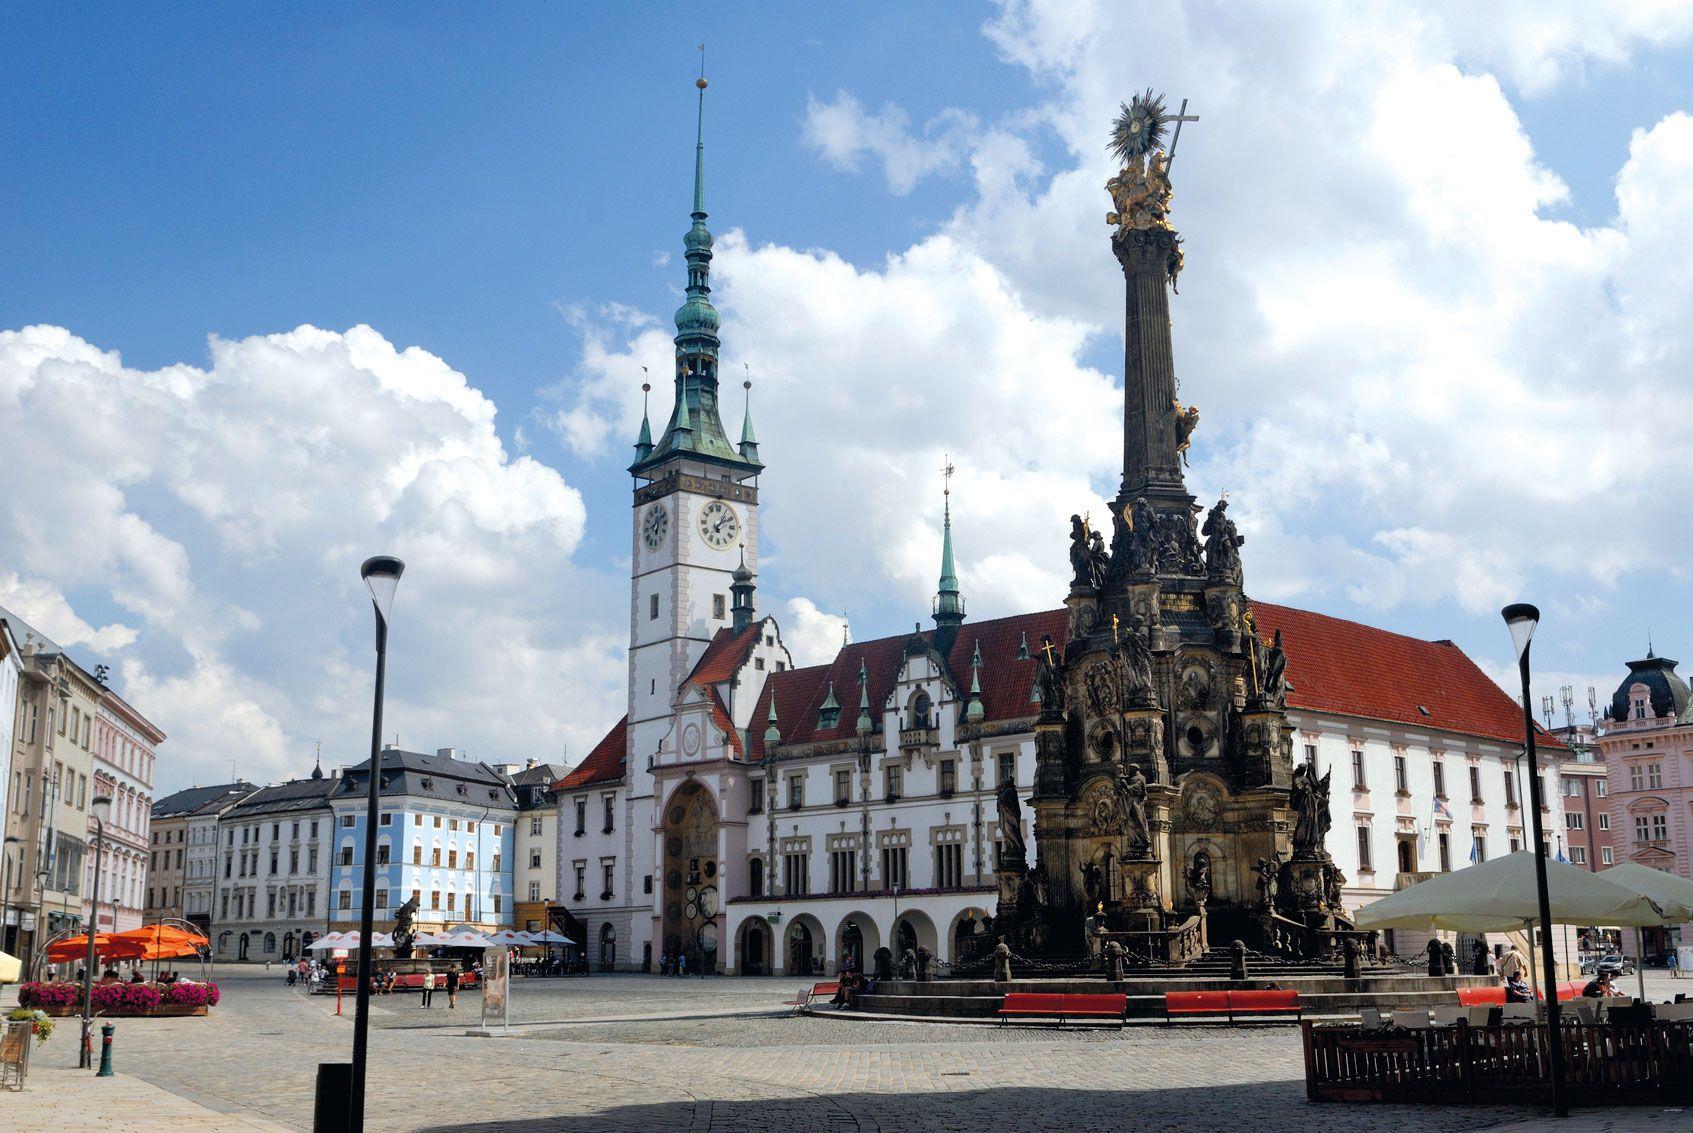 Olomouc Tschechische Republik Stockfoto web